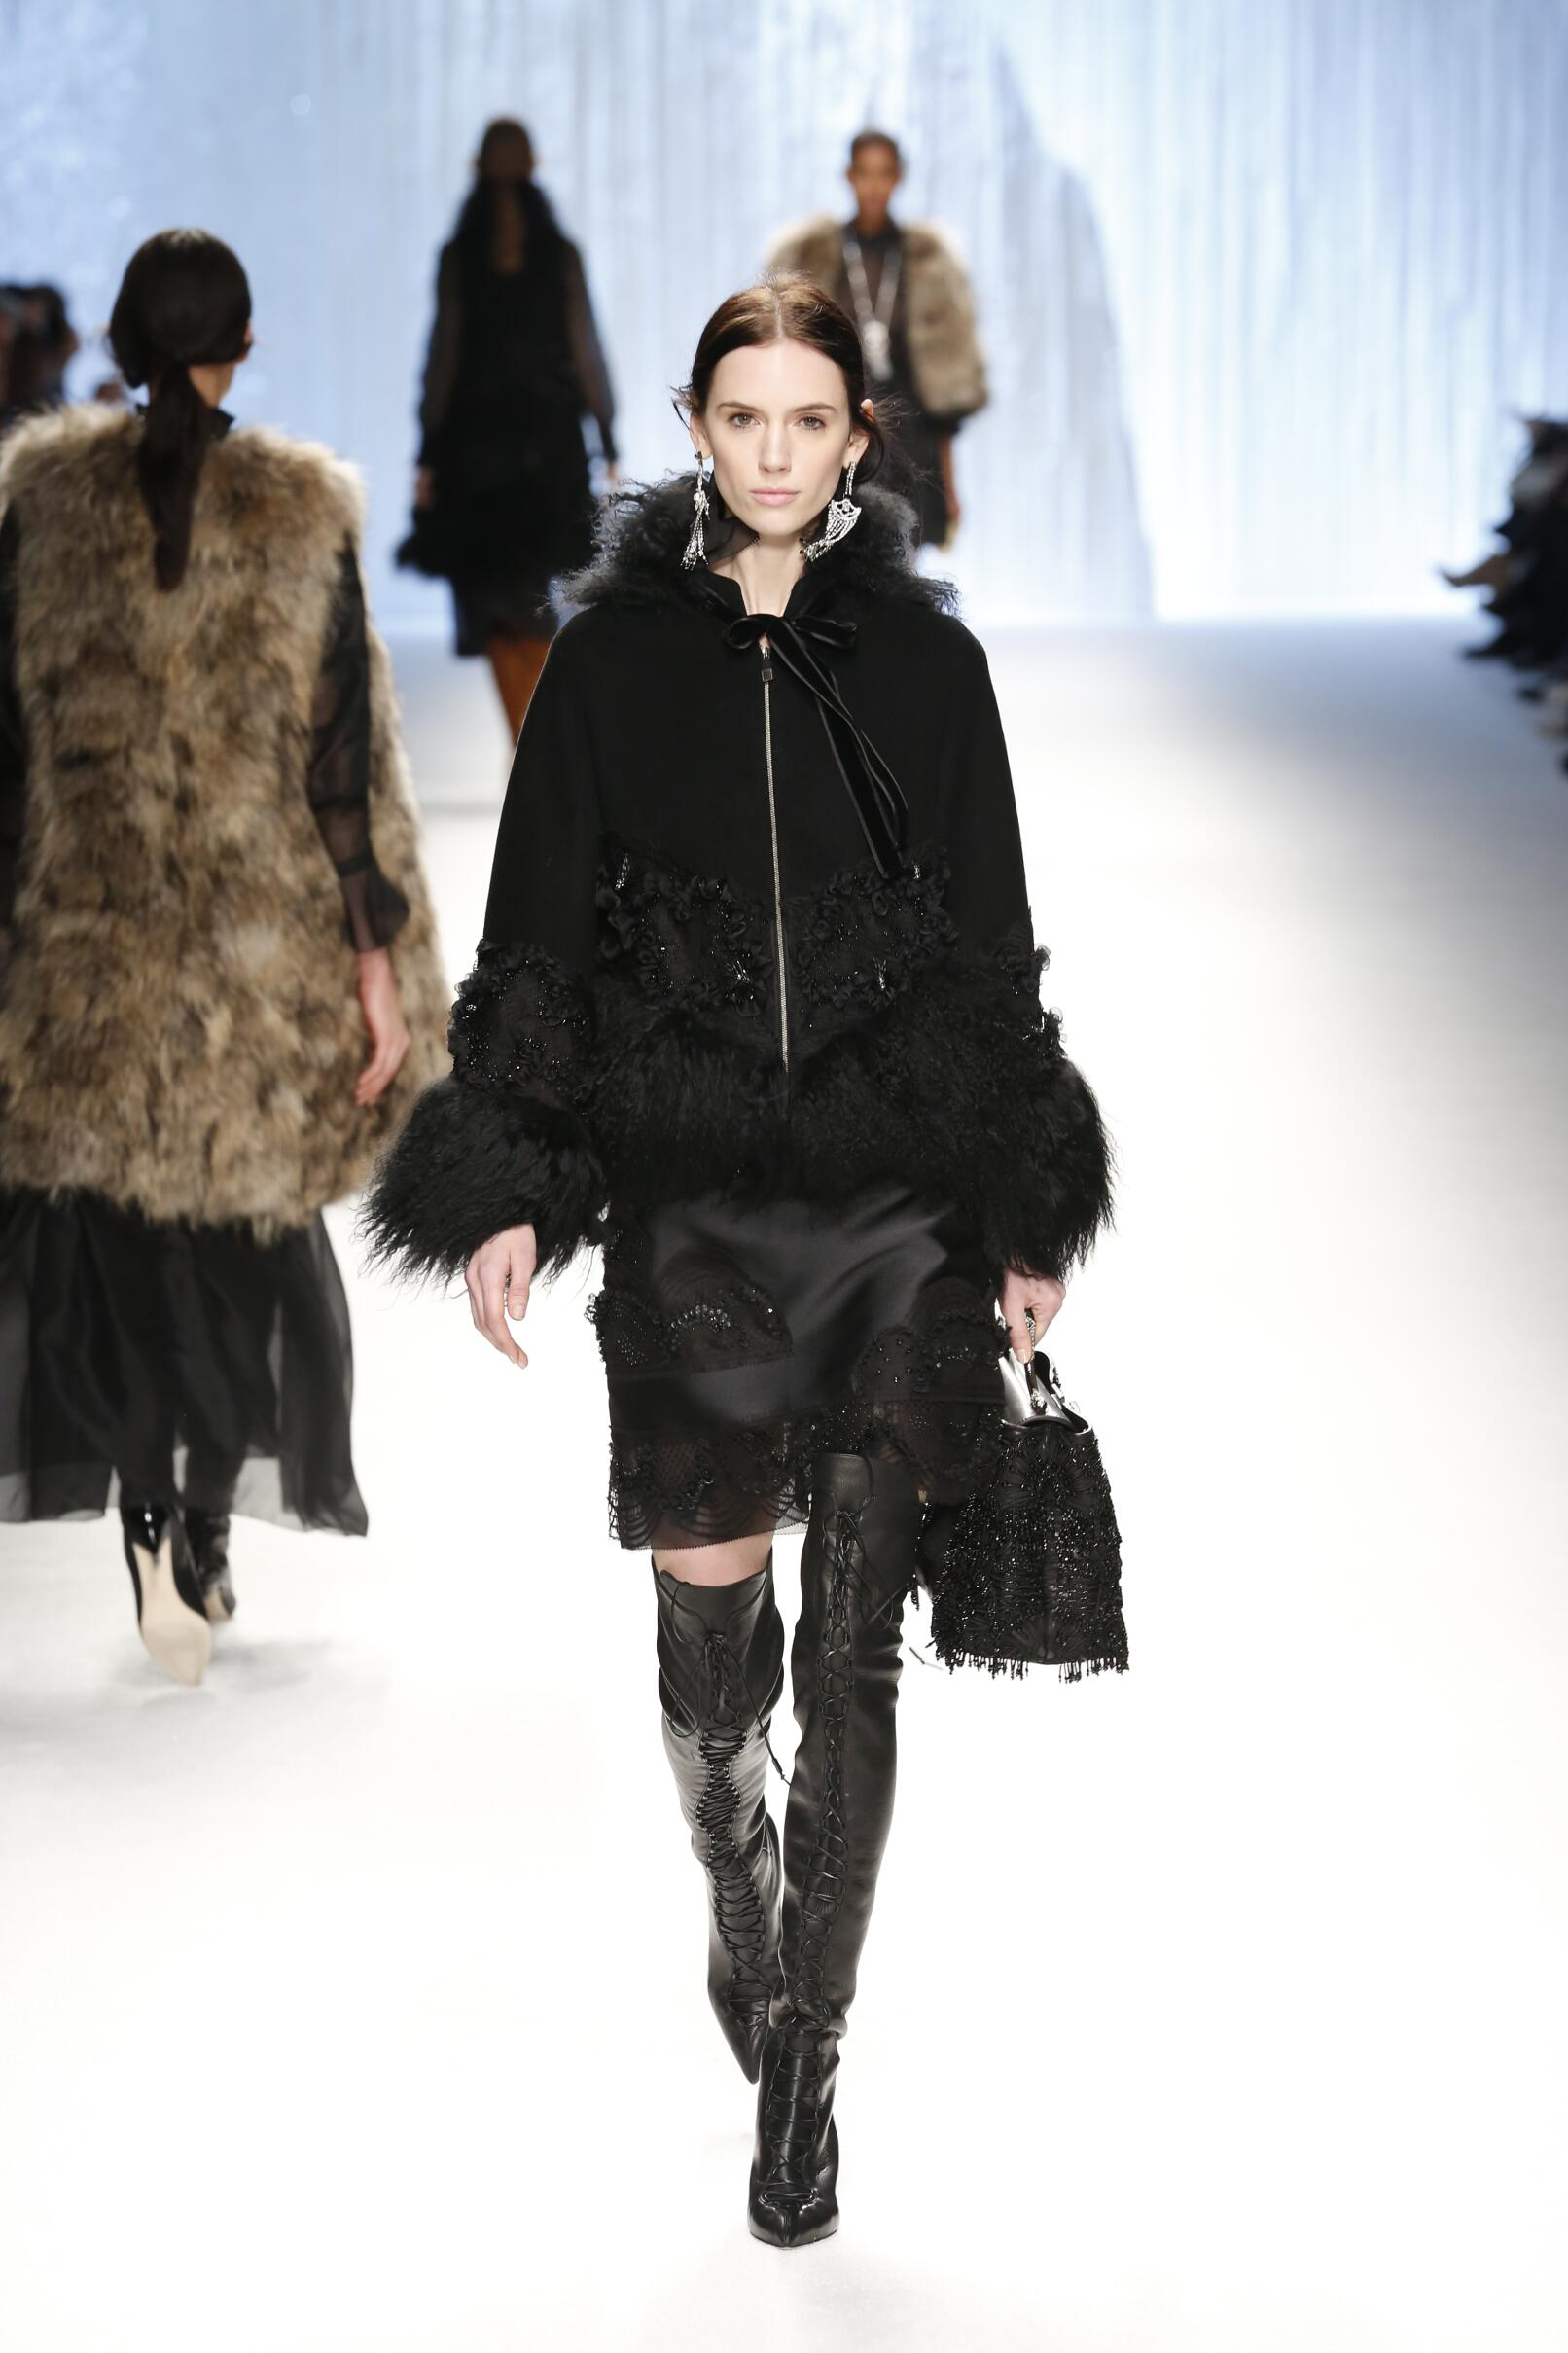 Catwalk Shiatzy Chen Fall Winter 2015 16 Women's Collection Paris Fashion Week